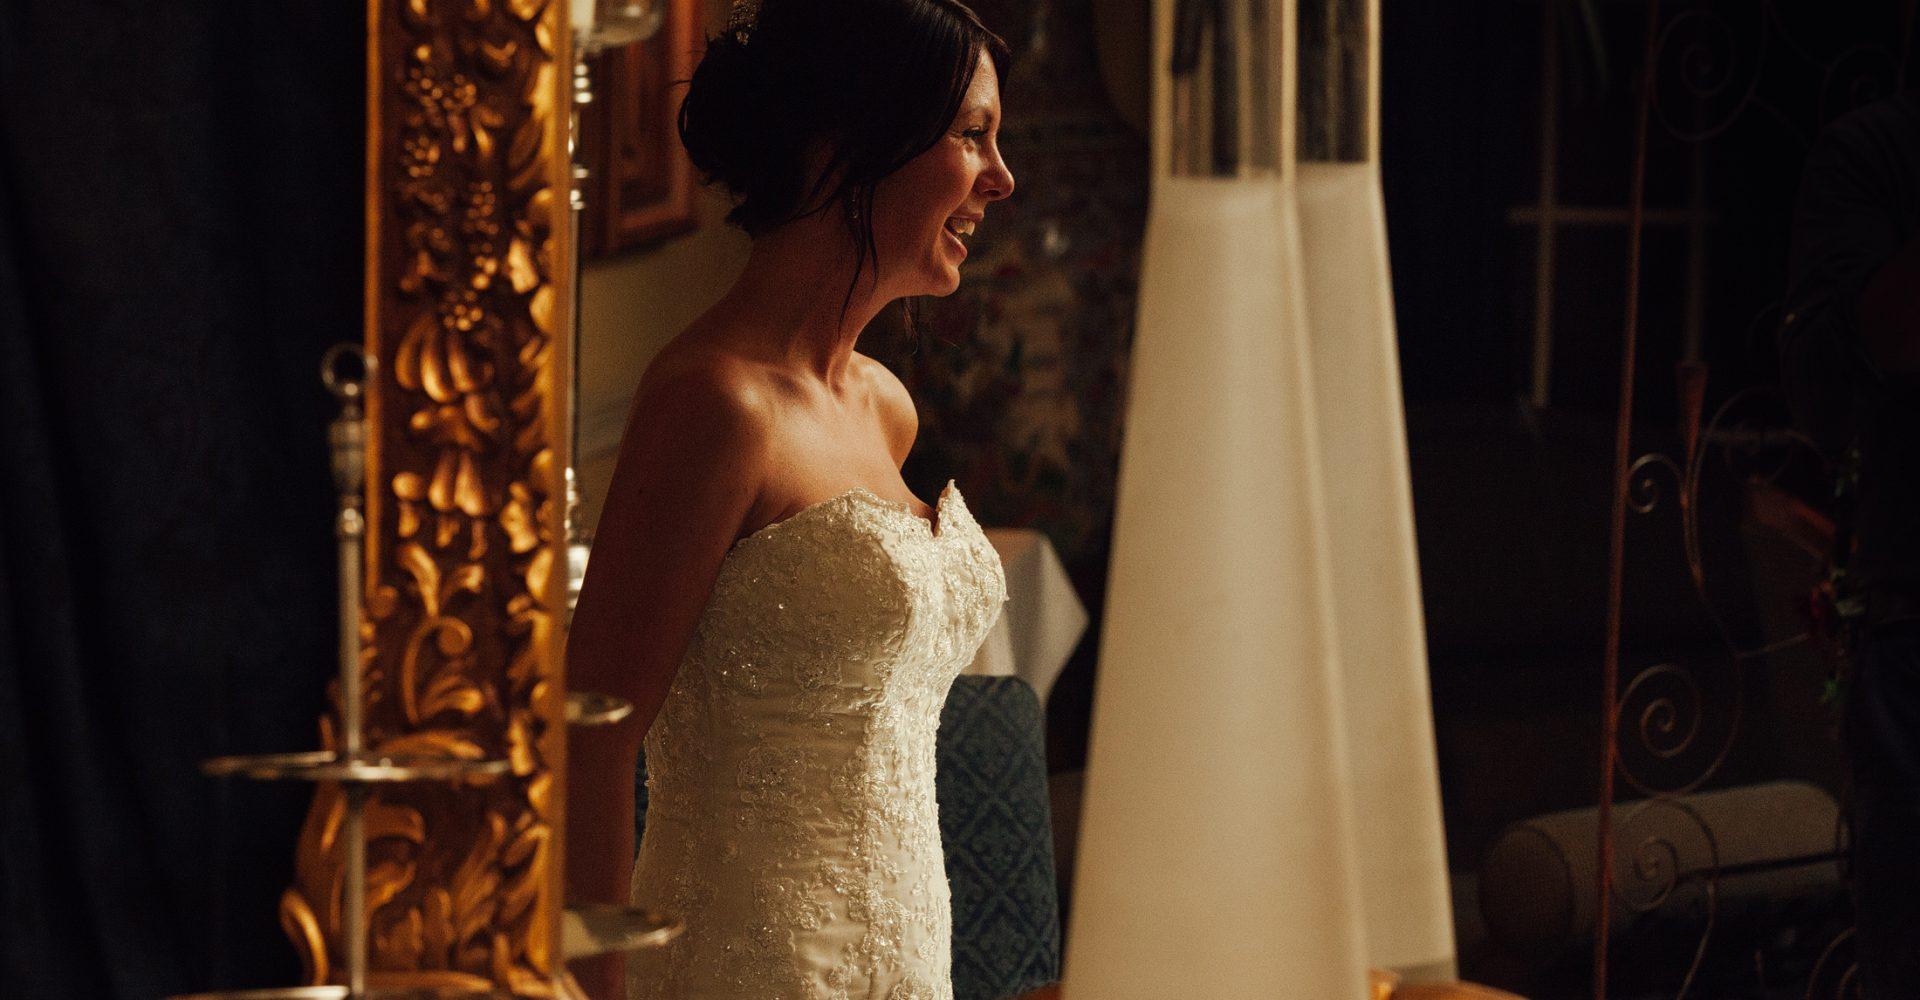 Bride in mirror with warm light